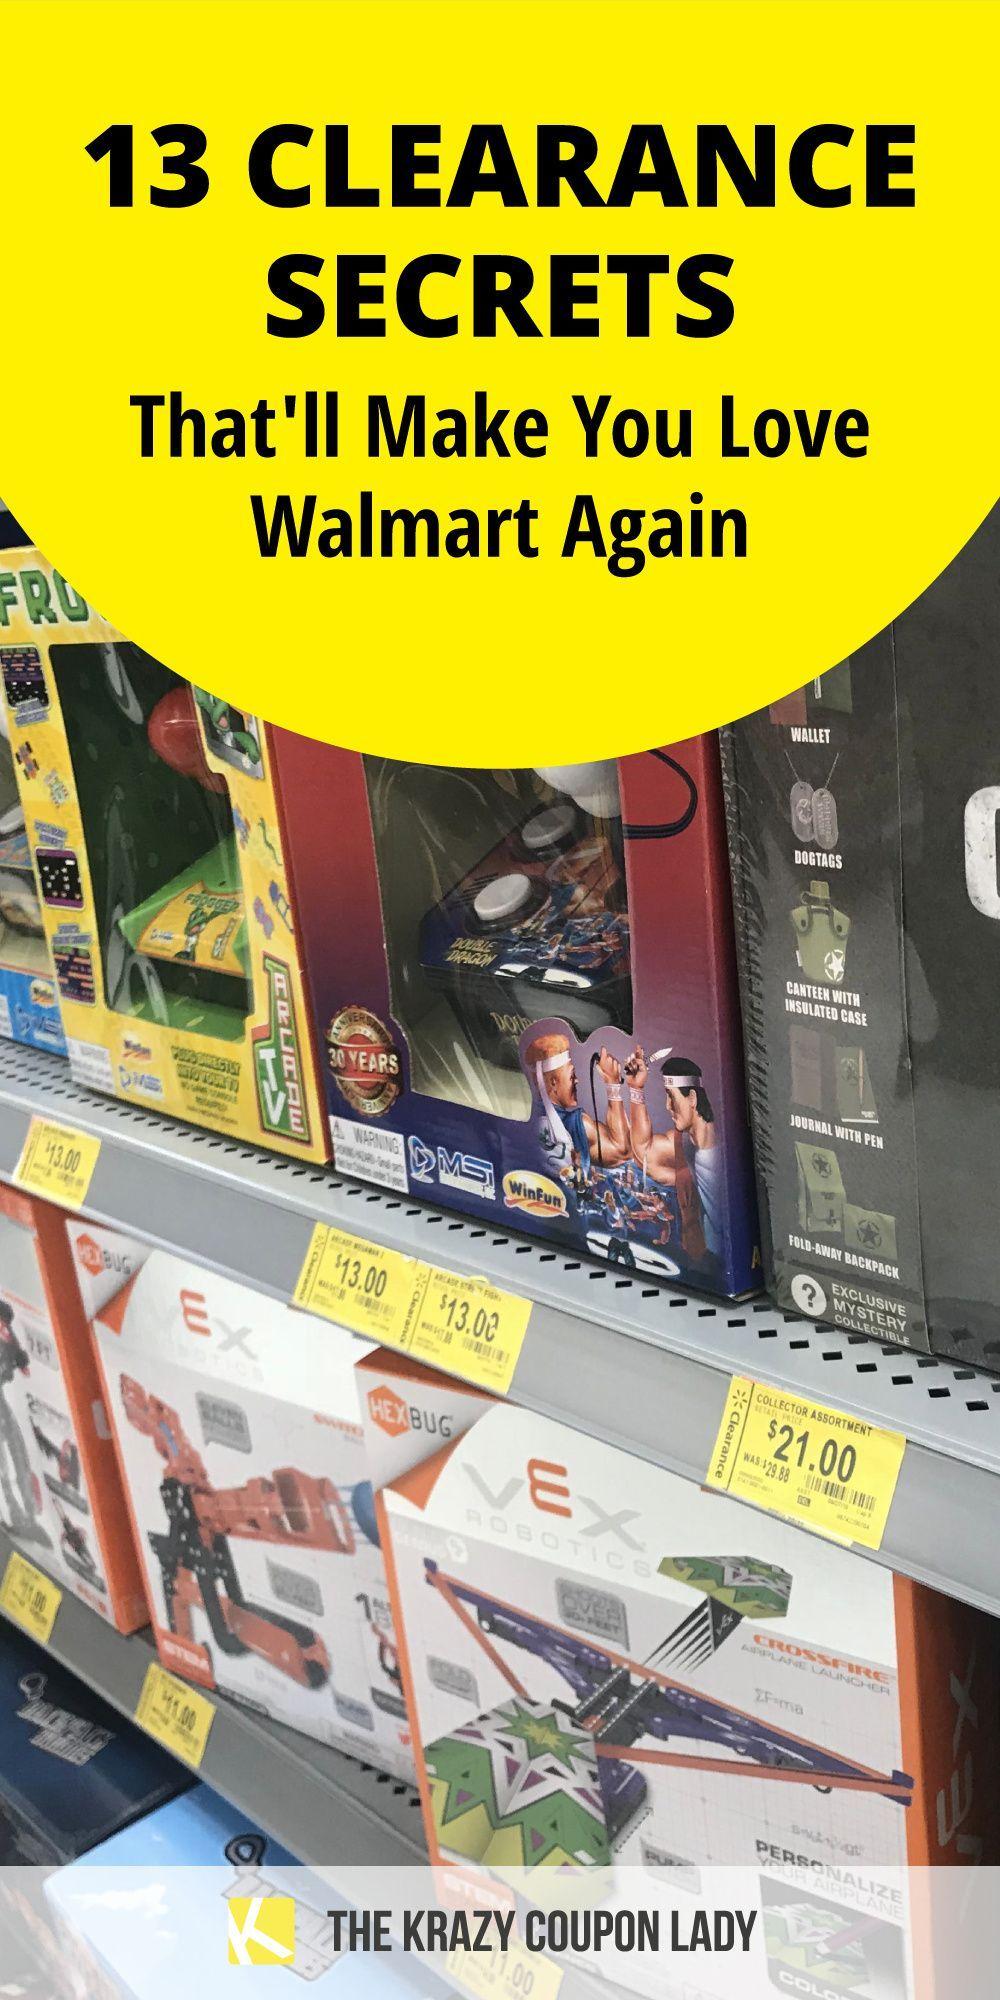 13 Clearance Secrets That Ll Make You Love Walmart Again Walmart Clearance Walmart The Krazy Coupon Lady